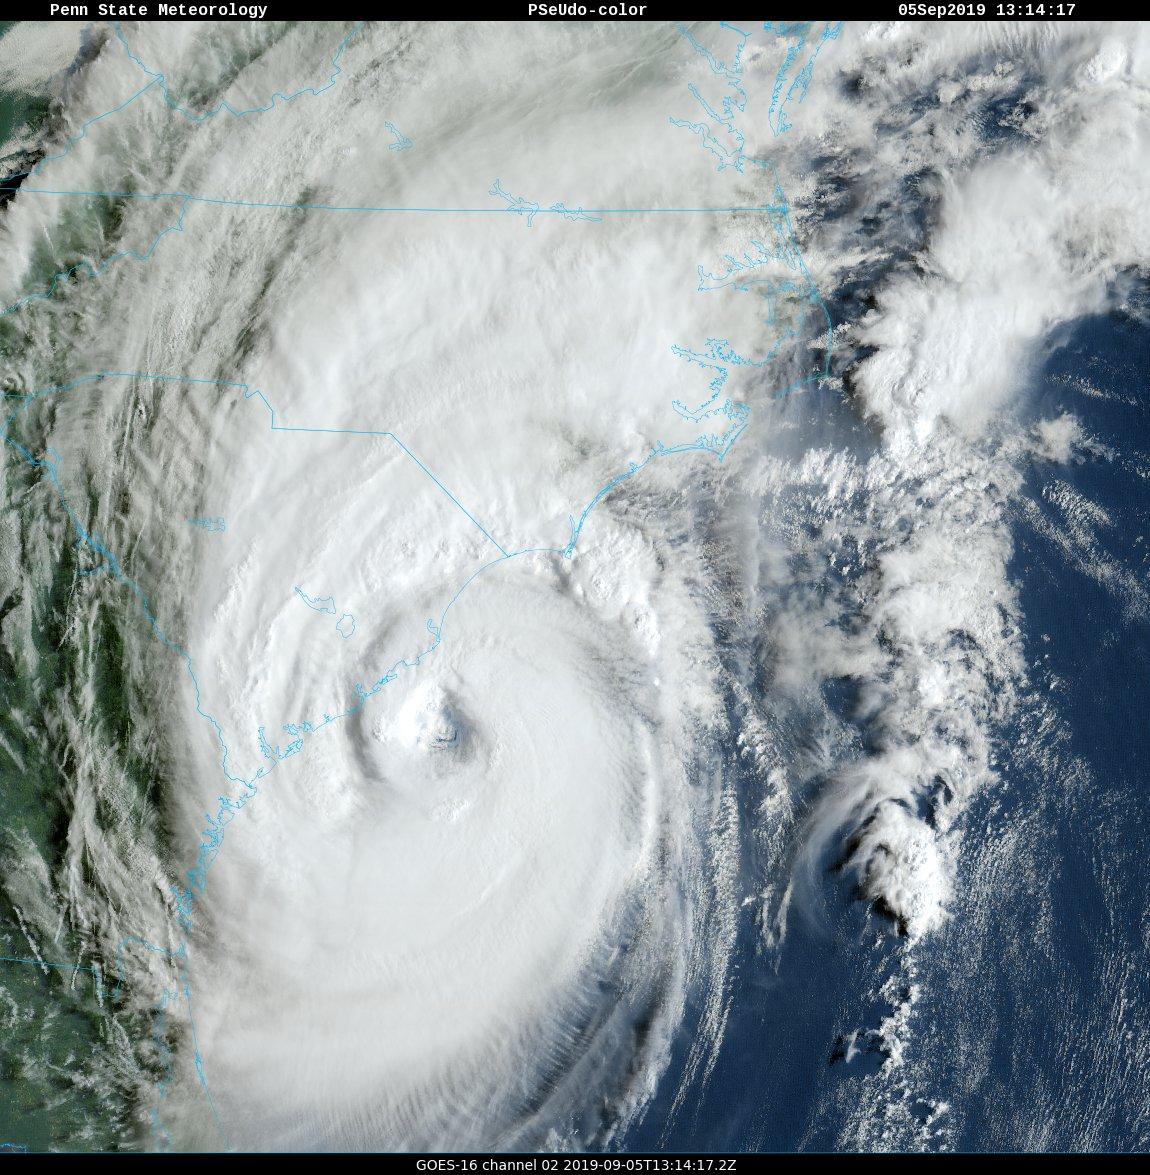 A close-up view of Hurricane Dorian as it moves slowly near the South Carolina coastline. Courtesy NOAA, Penn State ewall